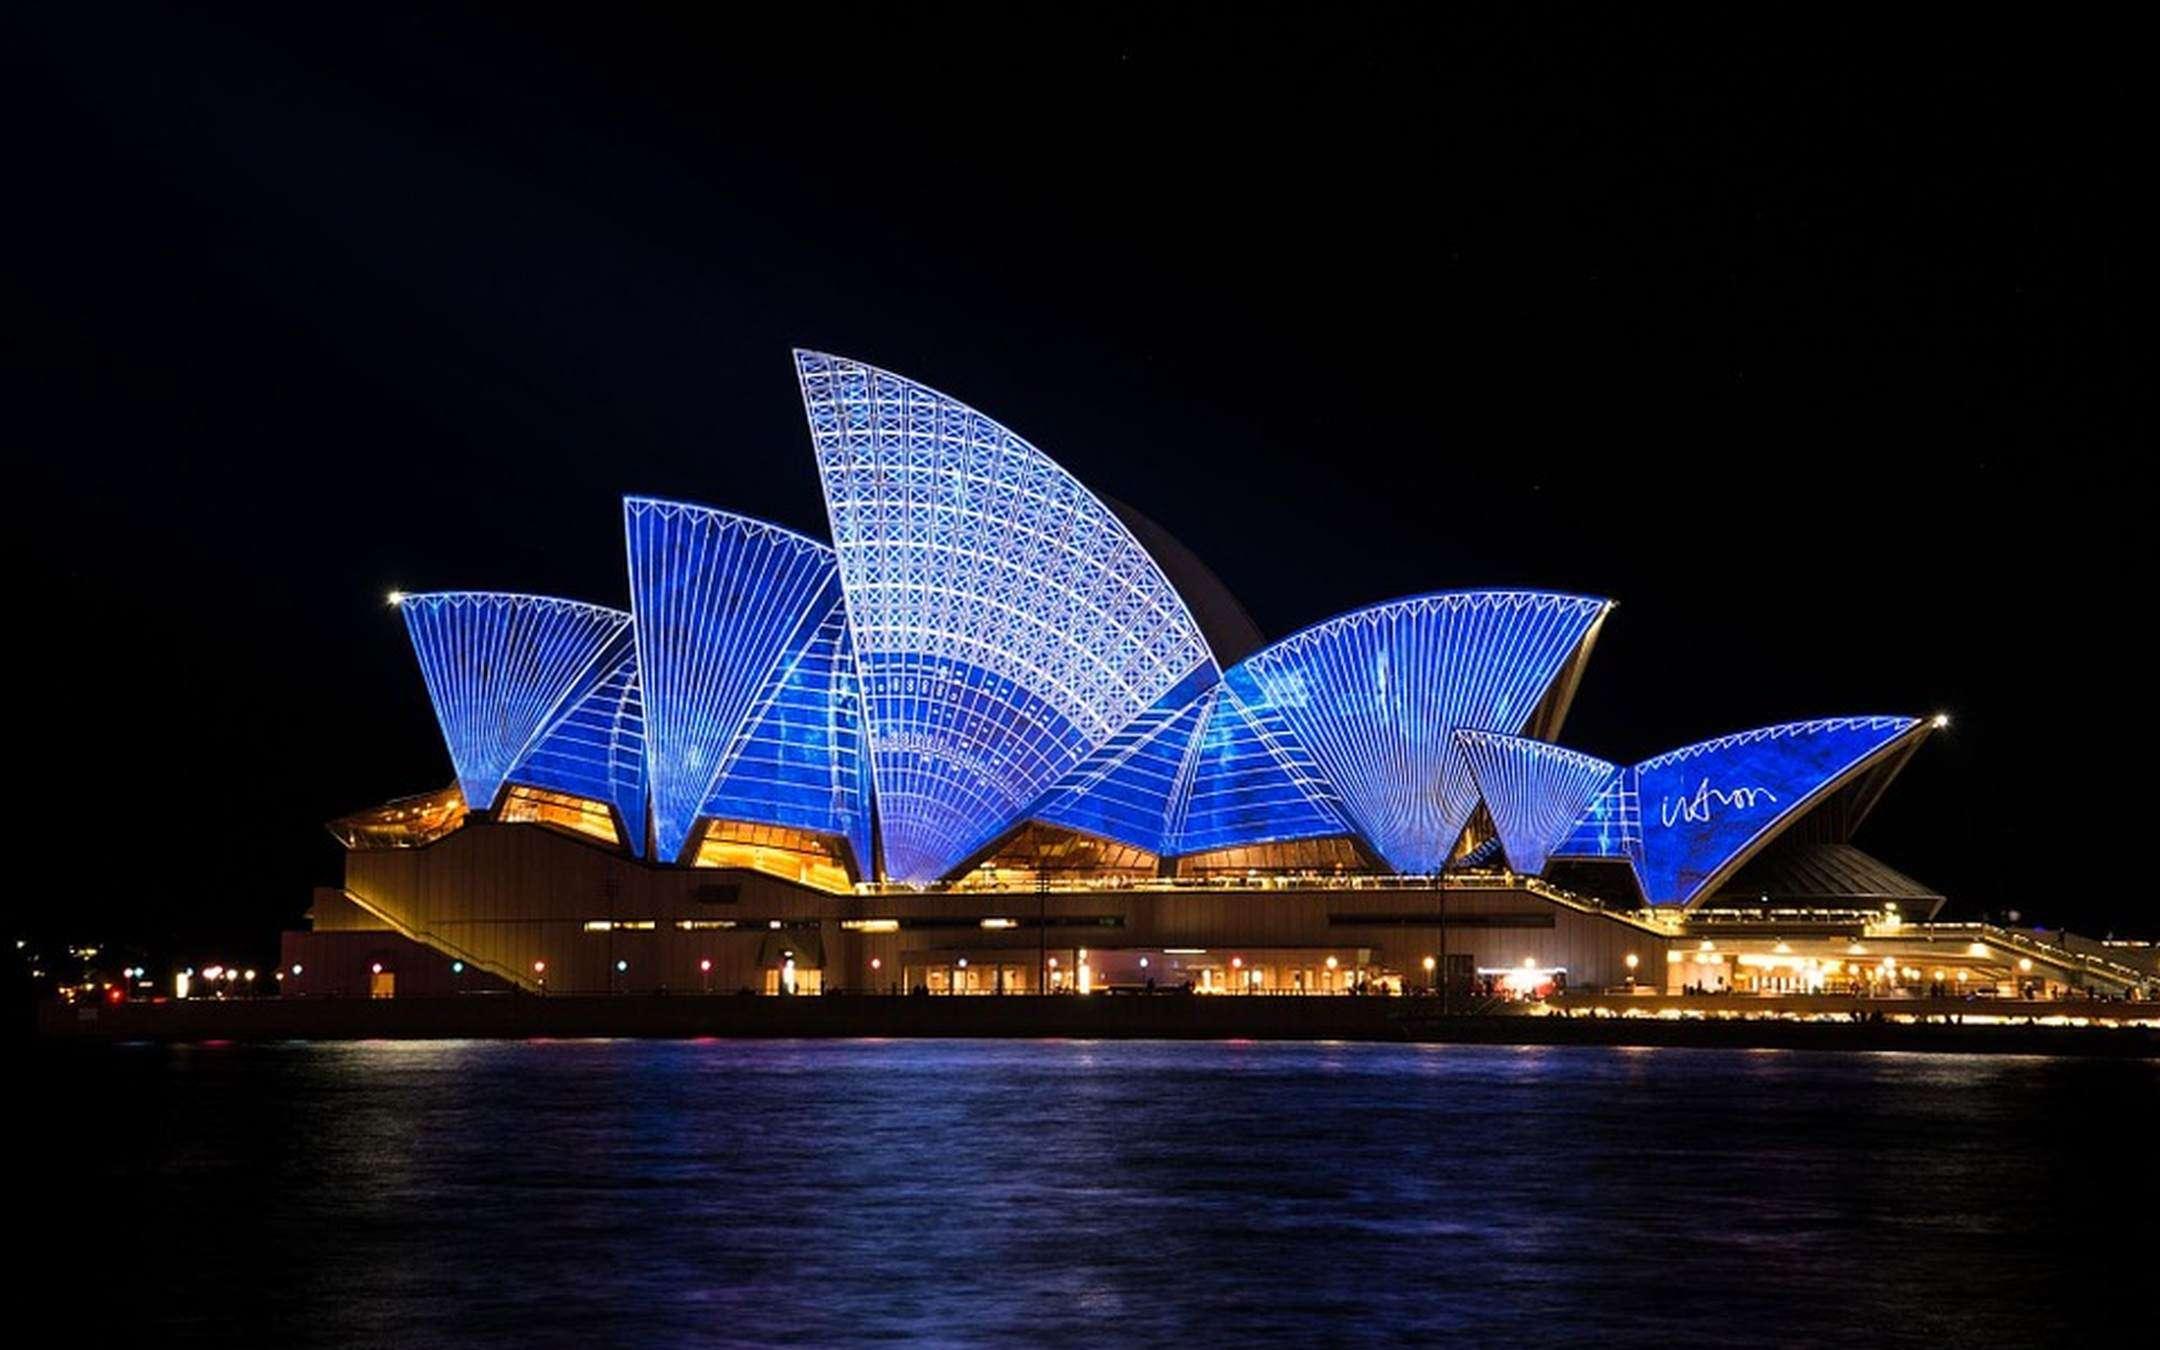 Facebook restores news to Australia